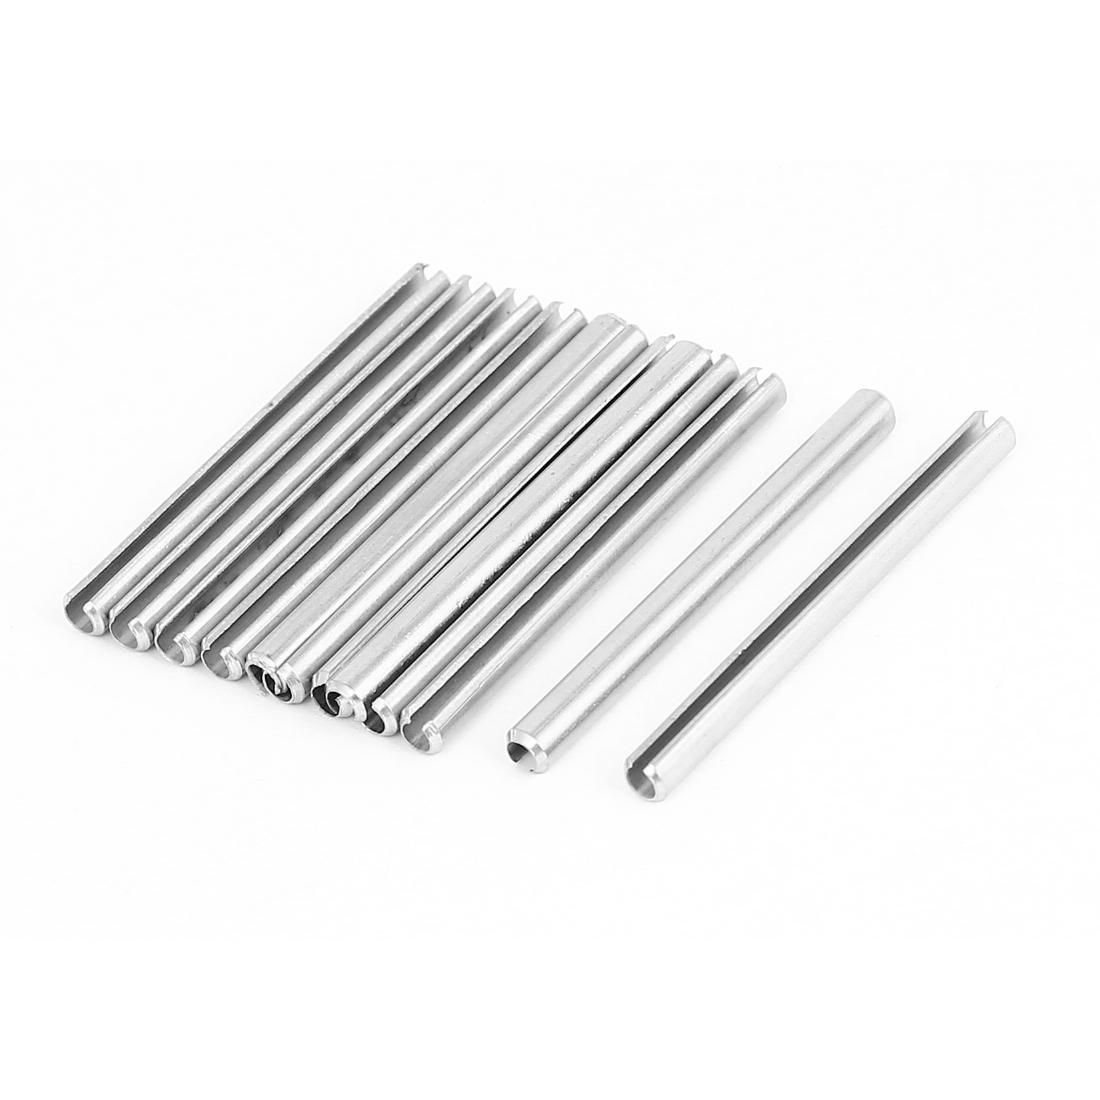 M4x50mm 304 Stainless Steel Split Spring Roll Dowel Pins Fasteners 10Pcs